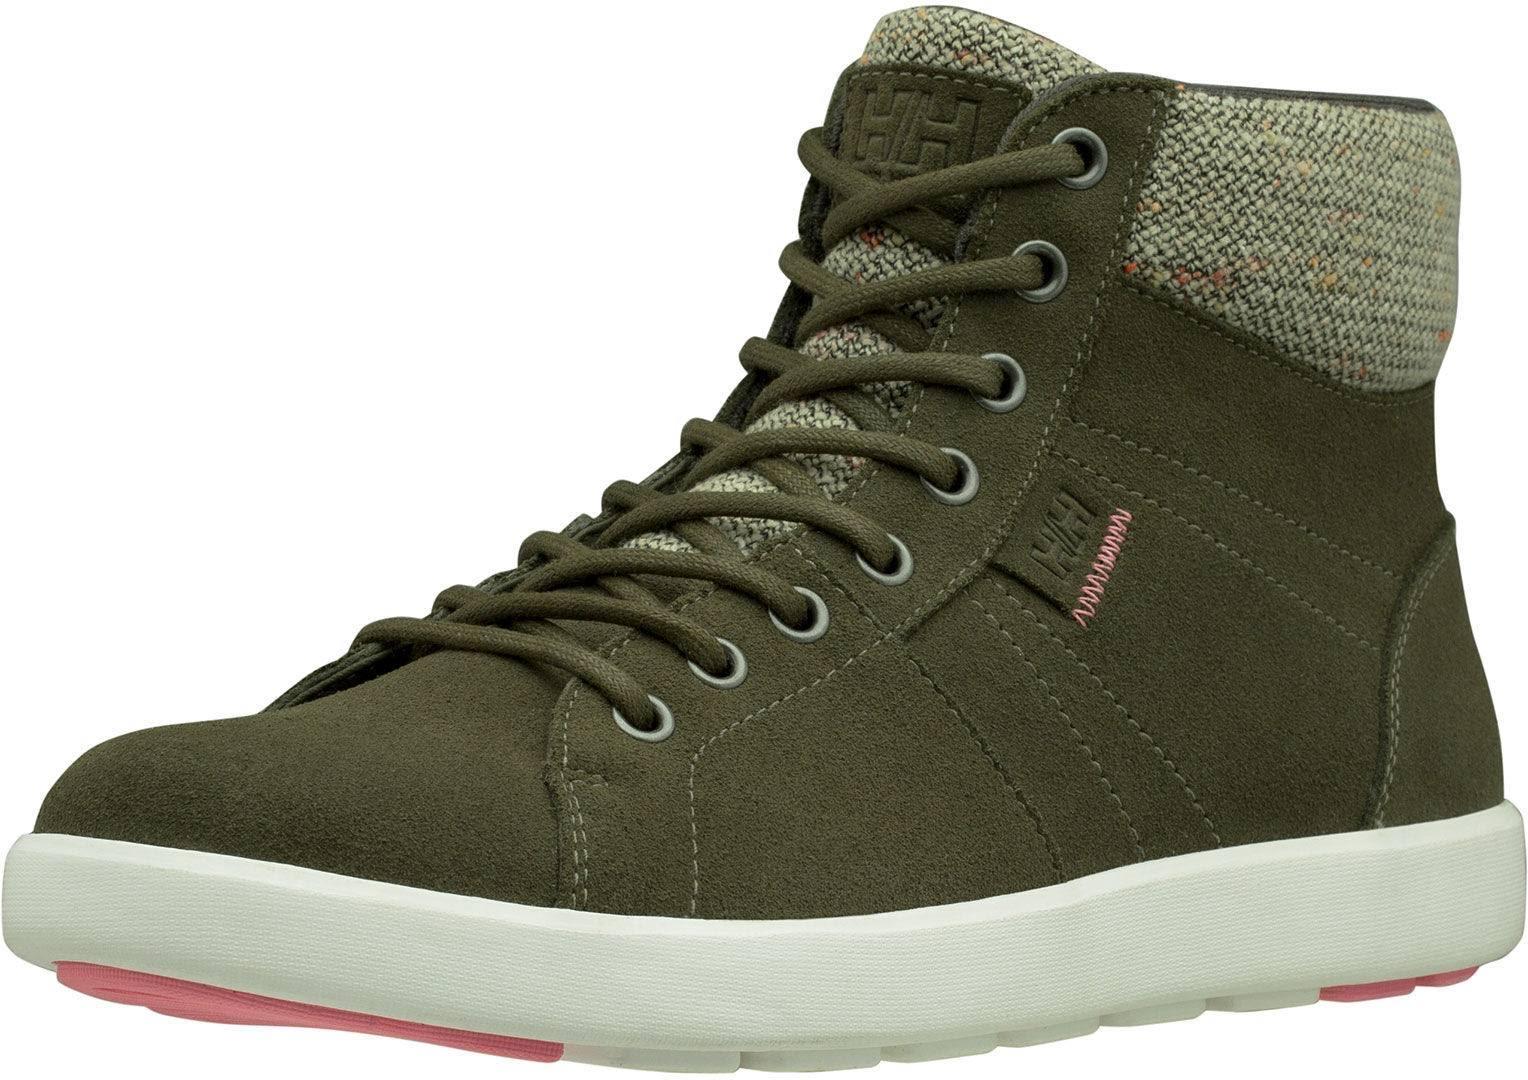 Zapatos Ivy Beluga Green Tamaño Madieke Para White Verde 8 Off 5 Helly Mujer Hansen RqgfzRSw